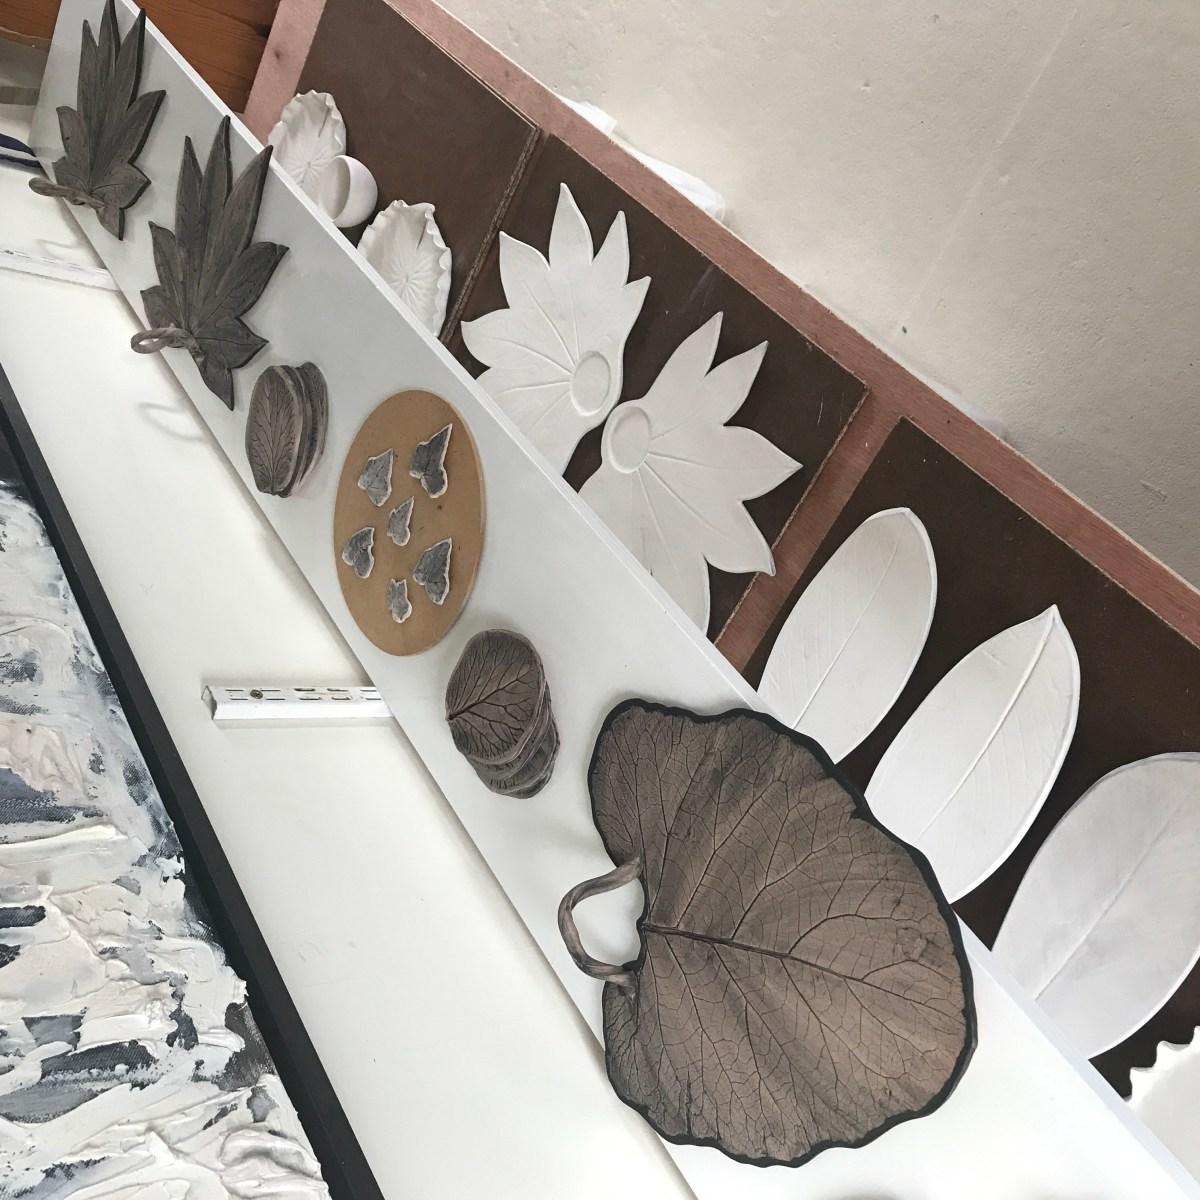 Burdock Leaf Sharing Platter by Sonya Ceramic Art 'Oxide Stage'